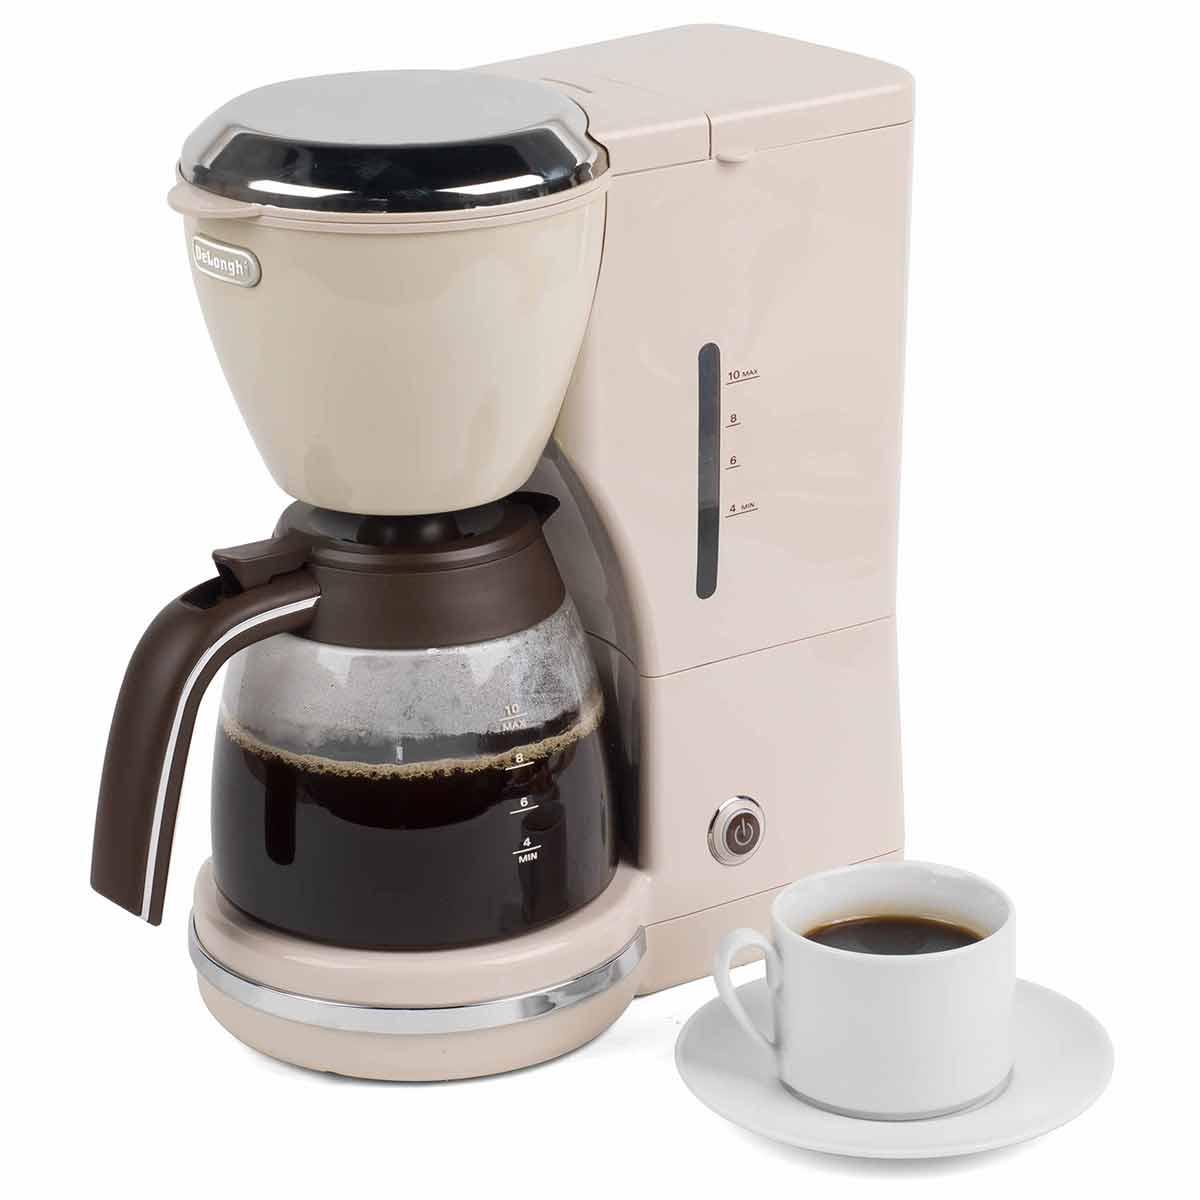 DeLonghi Icona Vintage Drip Coffee Machine 1.25 Litre 1000W, Beige